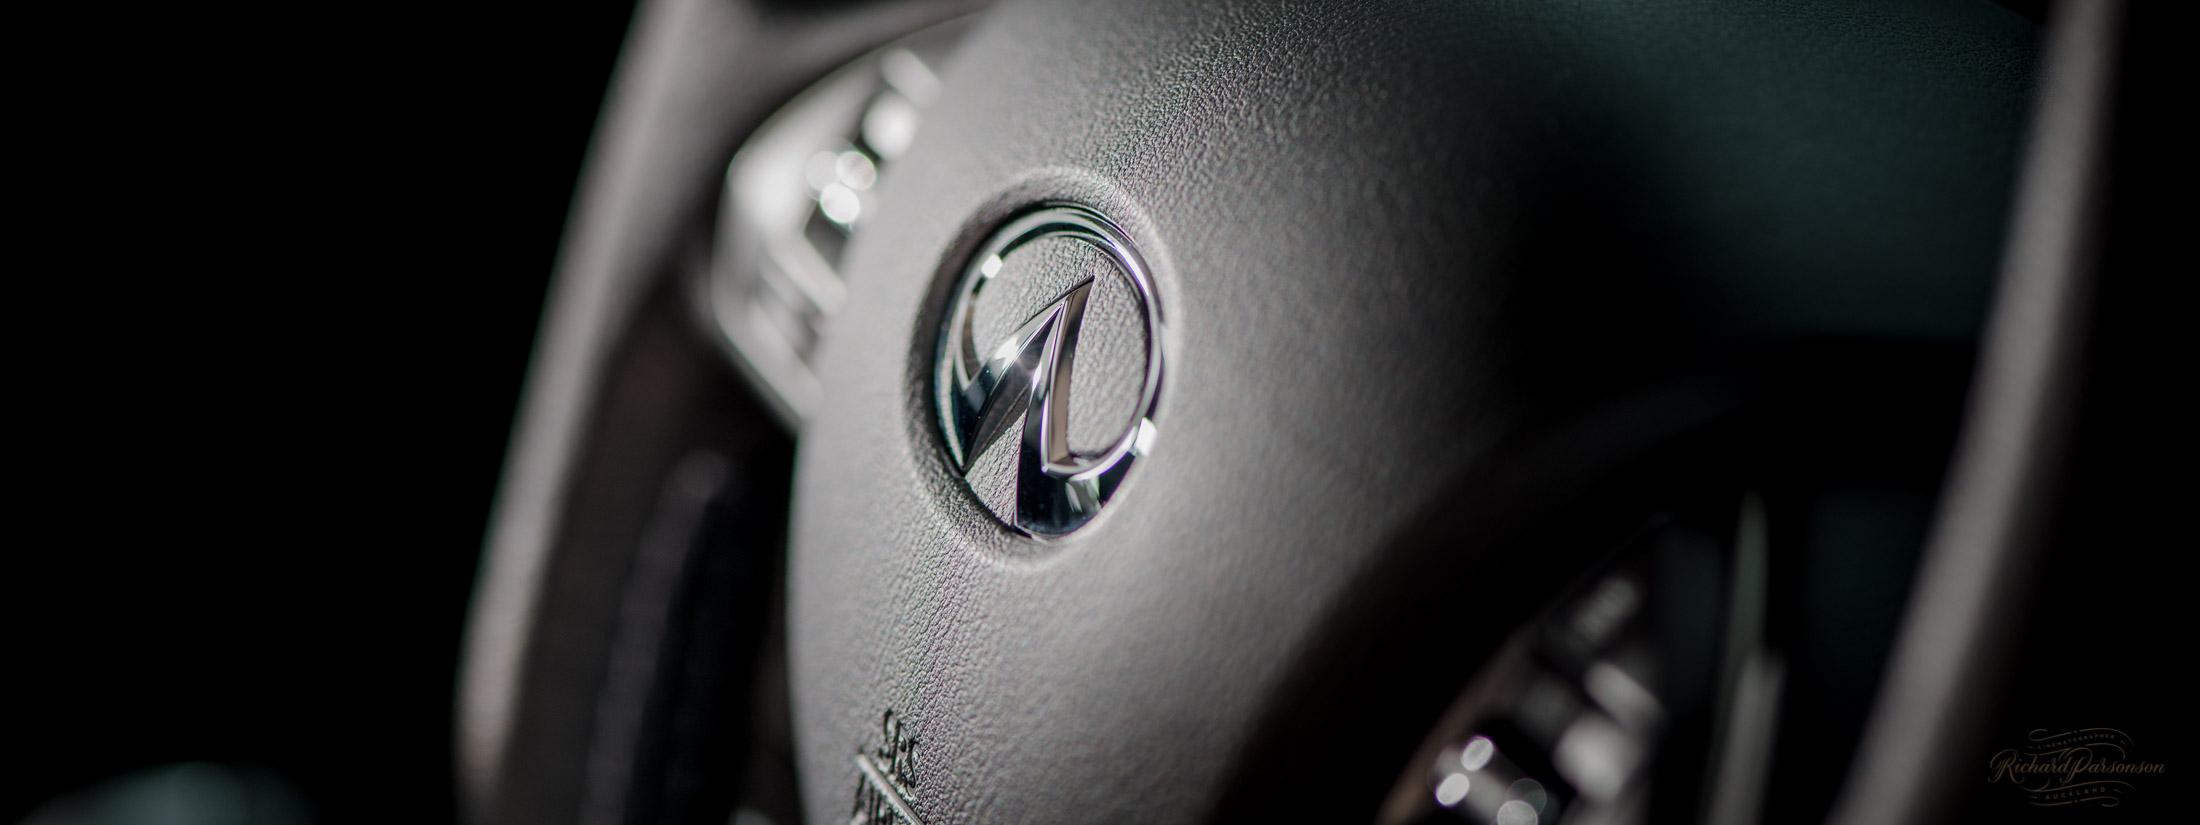 professional car photographer auckland